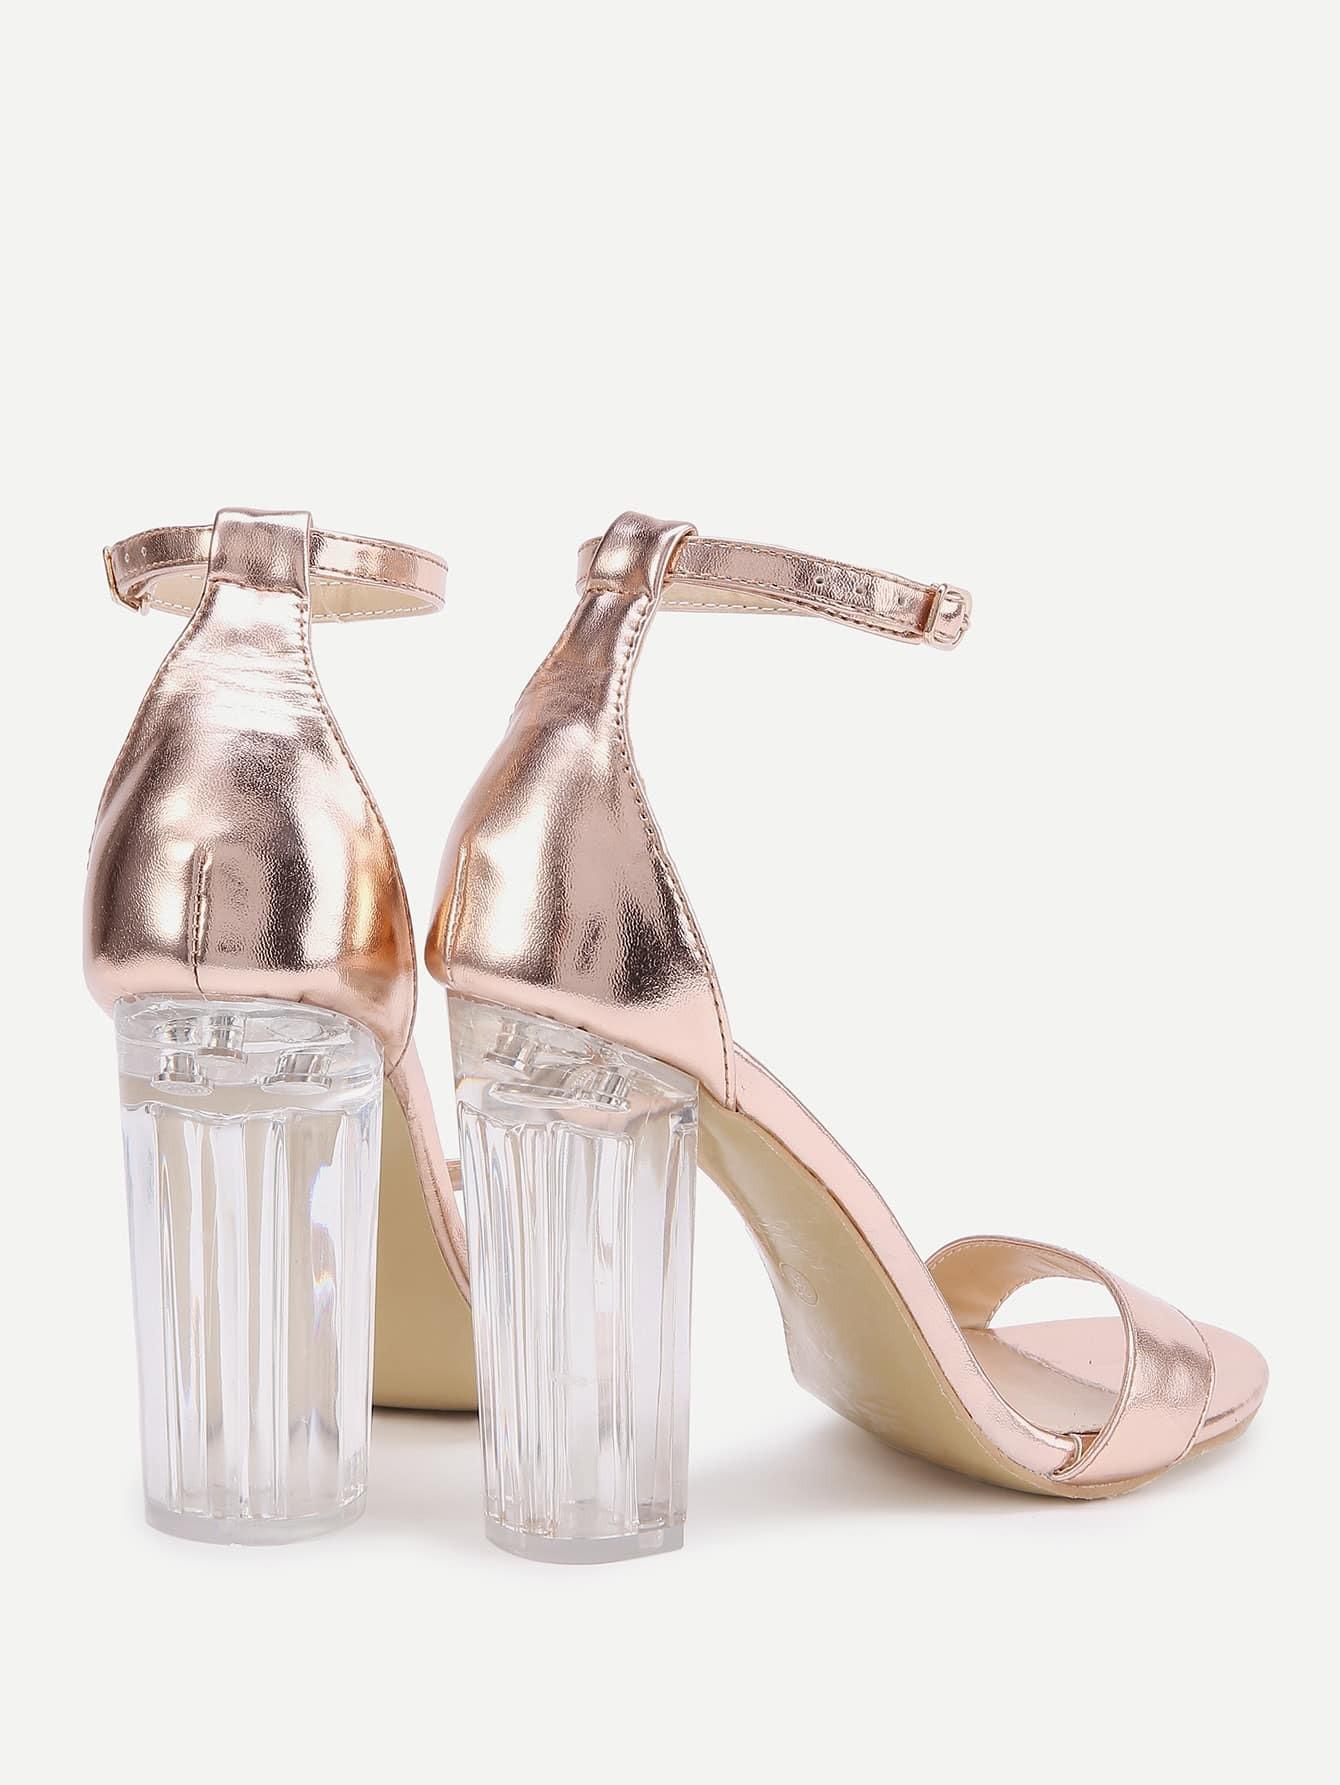 high heel shoe chair value city chairs that recline rose gold lucite sandals shein sheinside